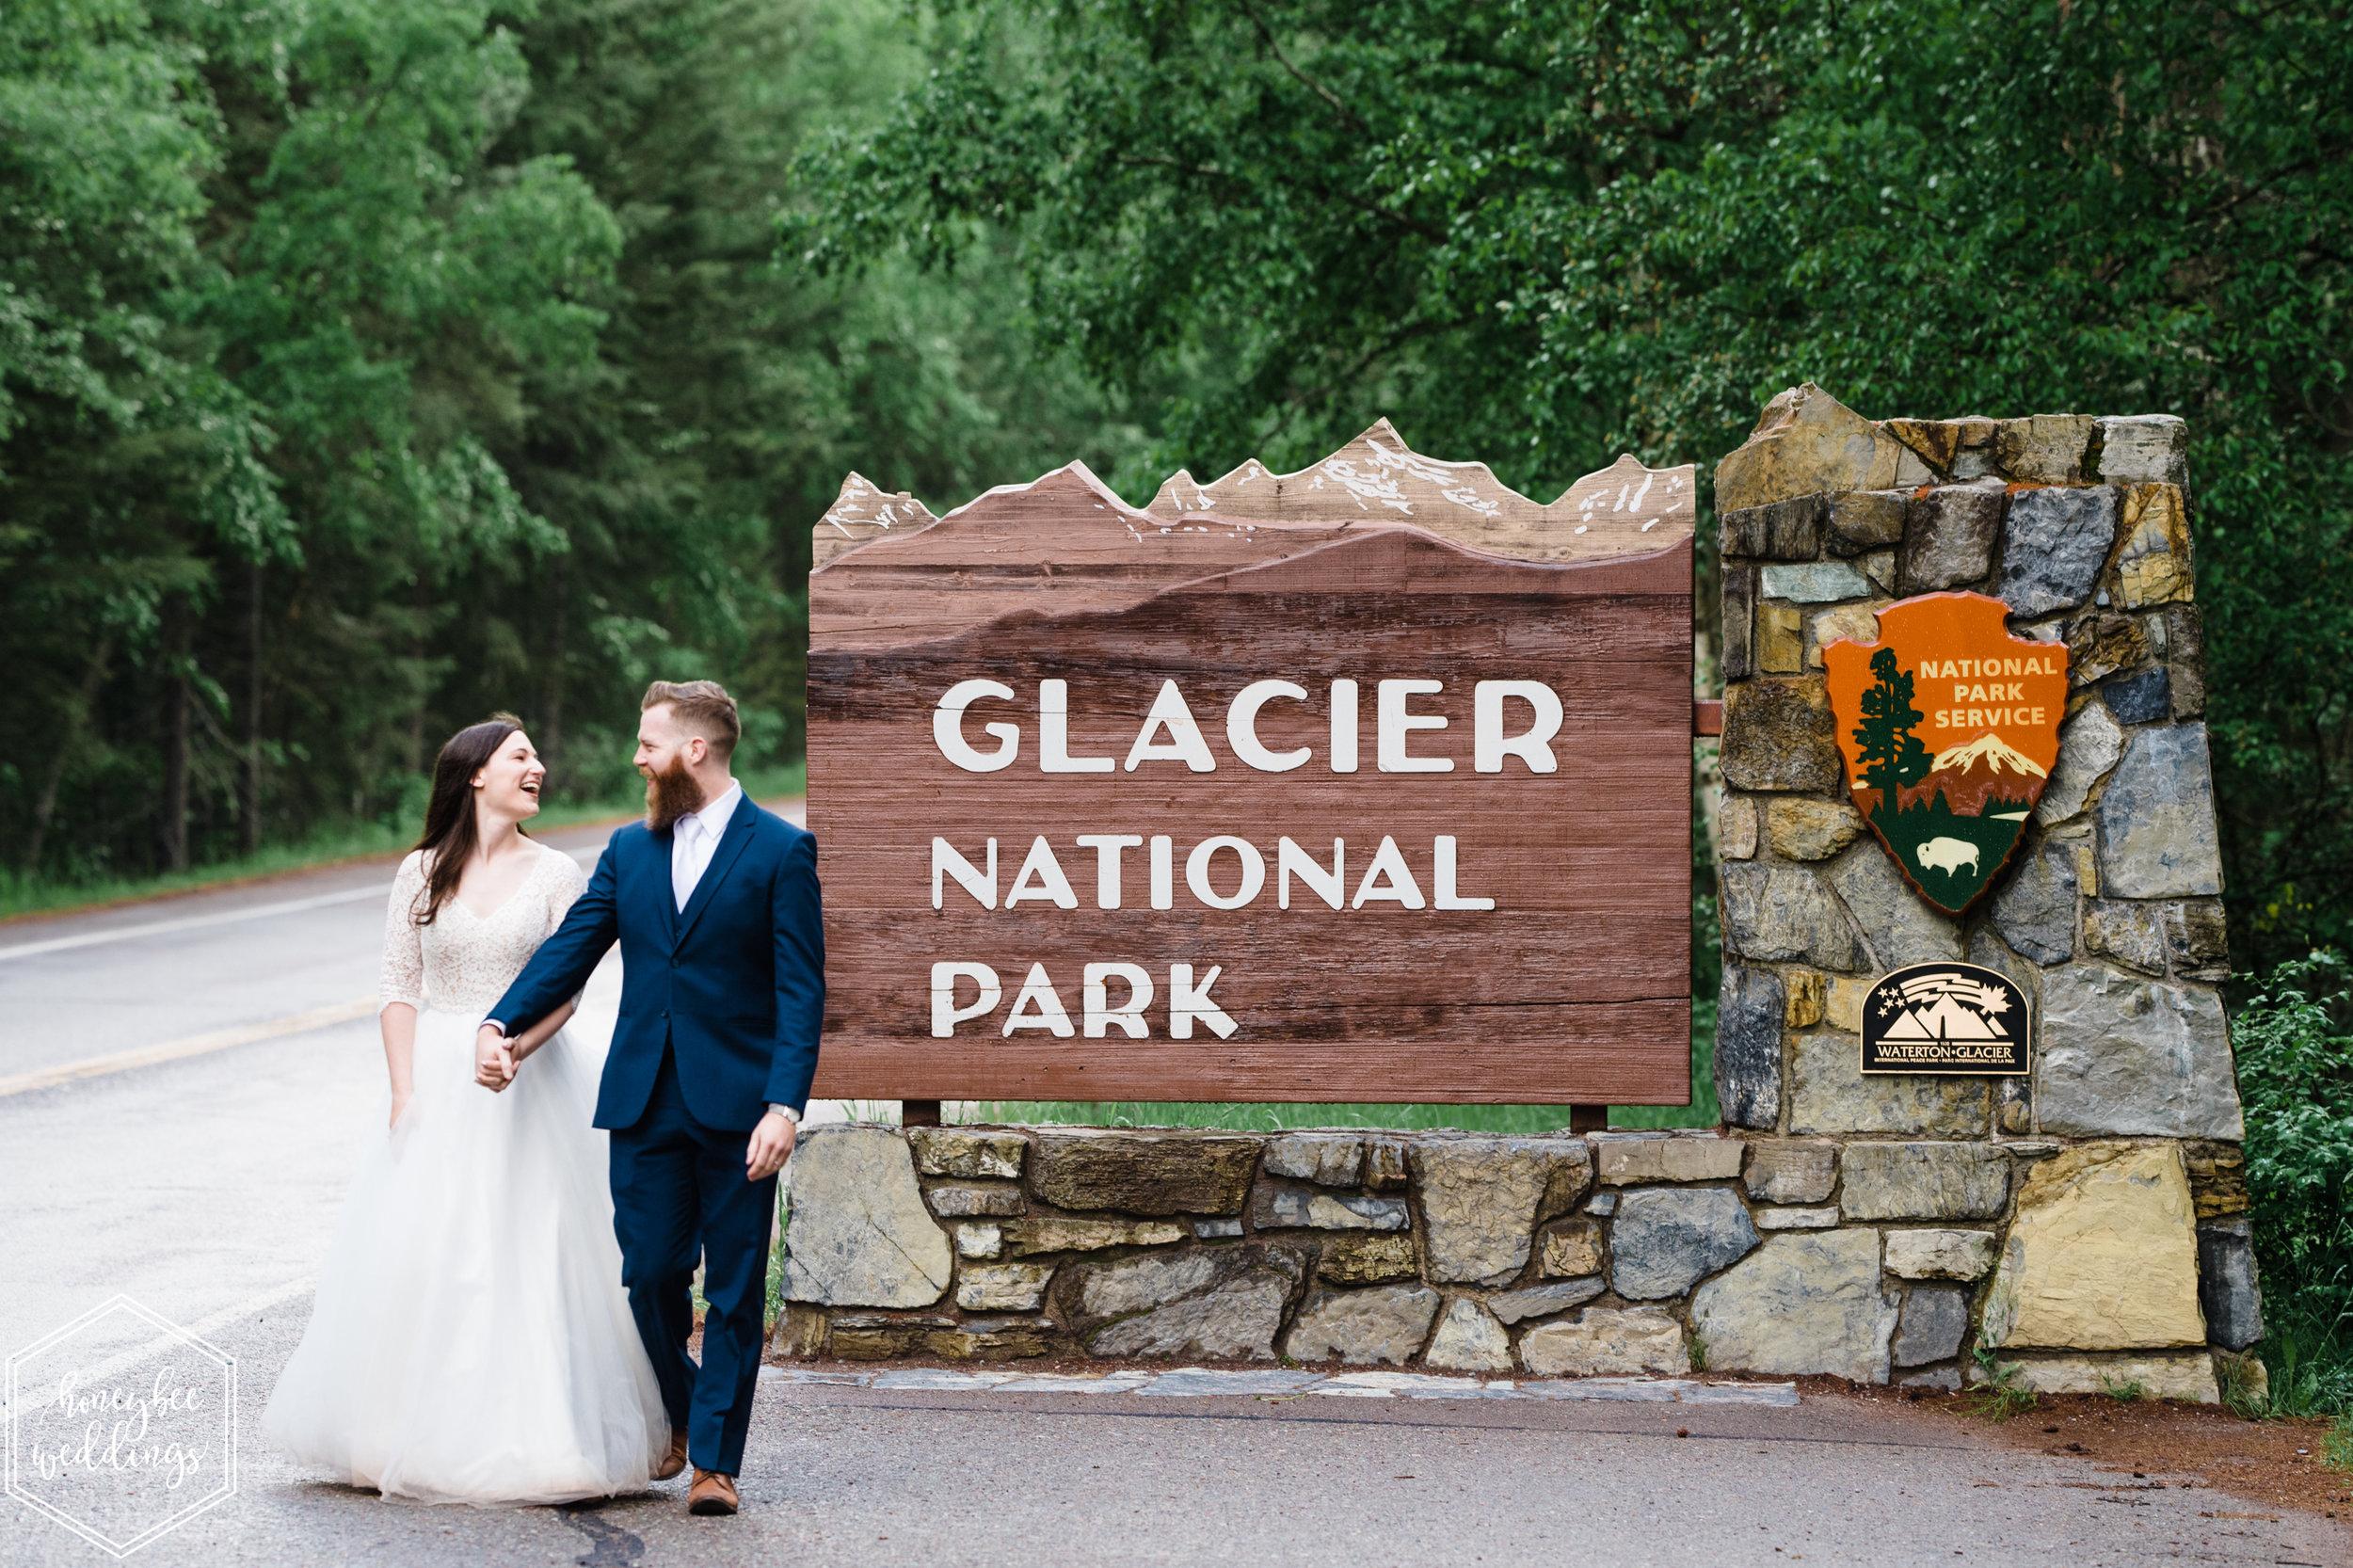 215Glacier National Park Wedding_Izaak Walton Inn Wedding_Honeybee Weddings_Norah & Kyle_June 09, 2019-11.jpg